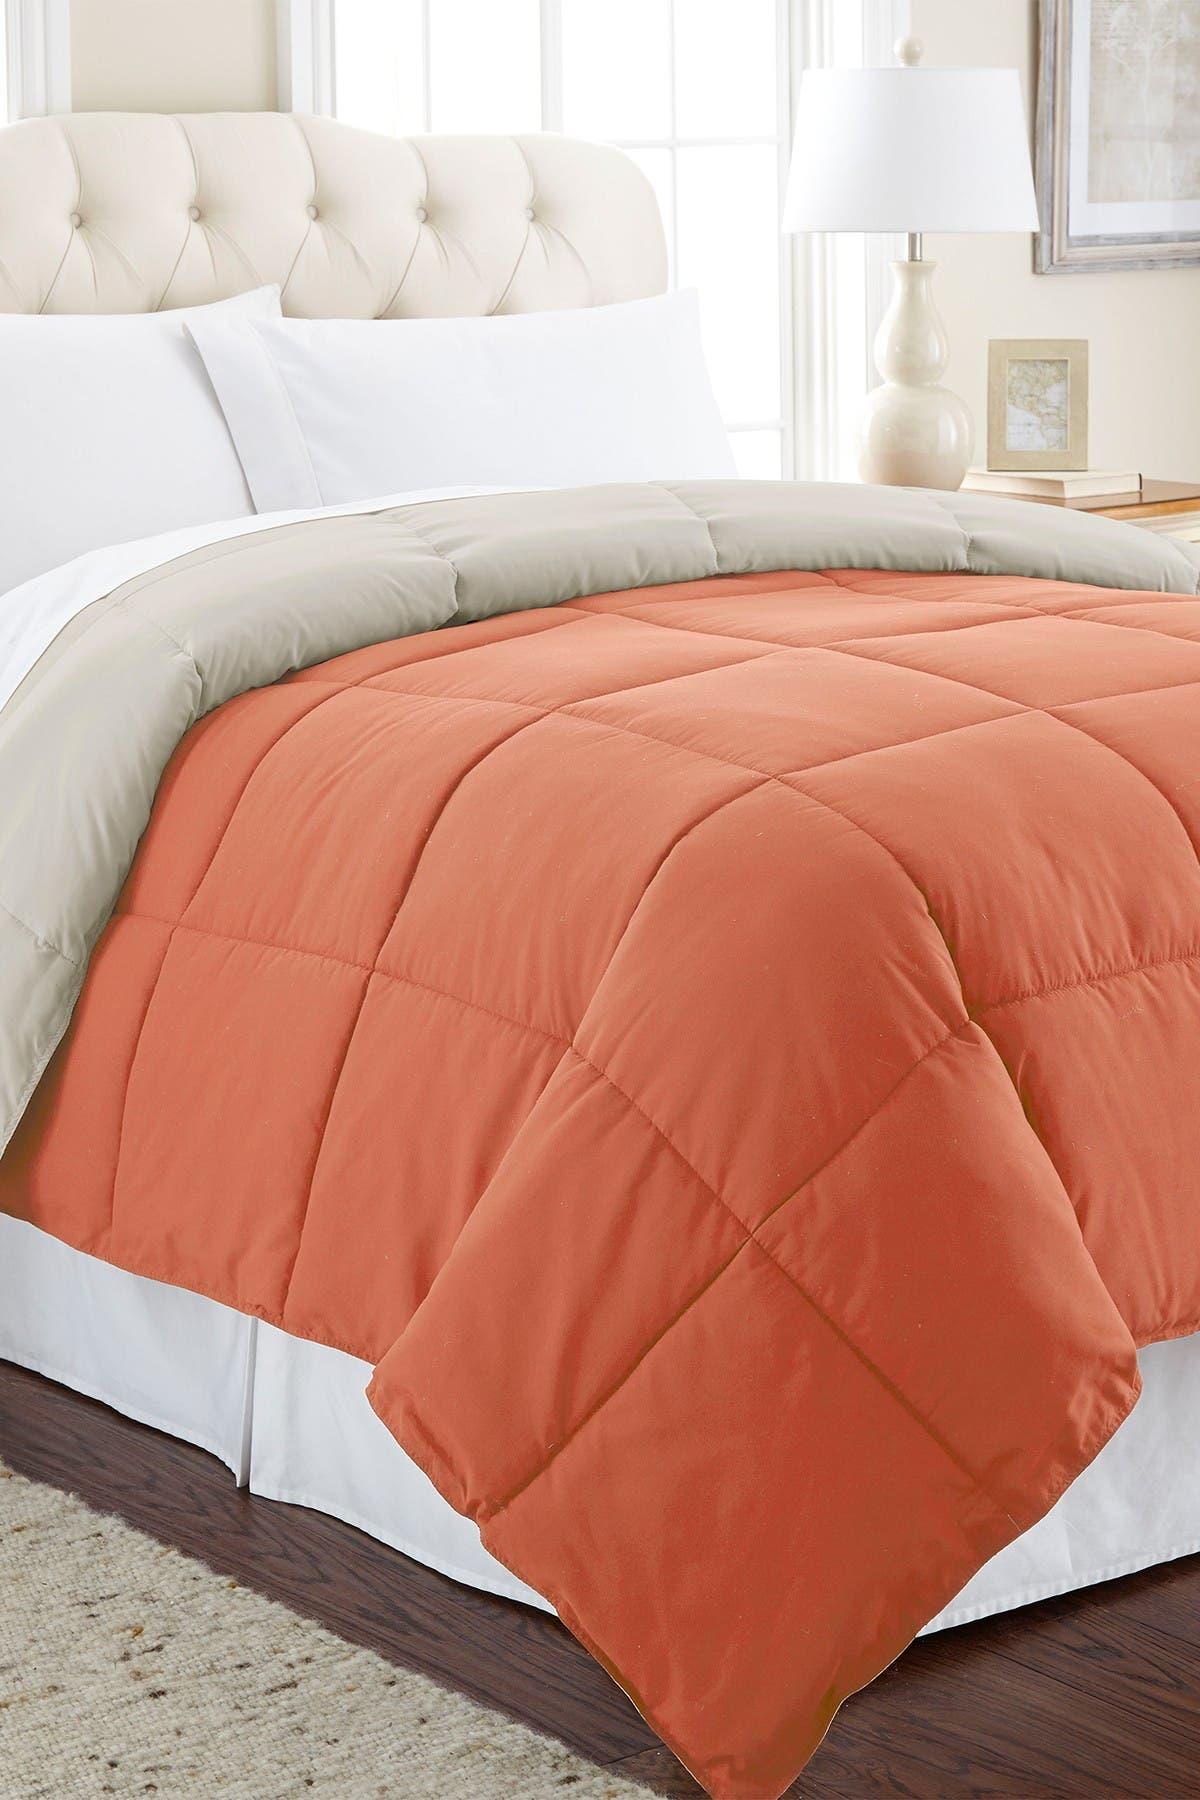 Image of Modern Threads Down Alternative Reversible Twin Comforter - Orange Rust/Oatmeal